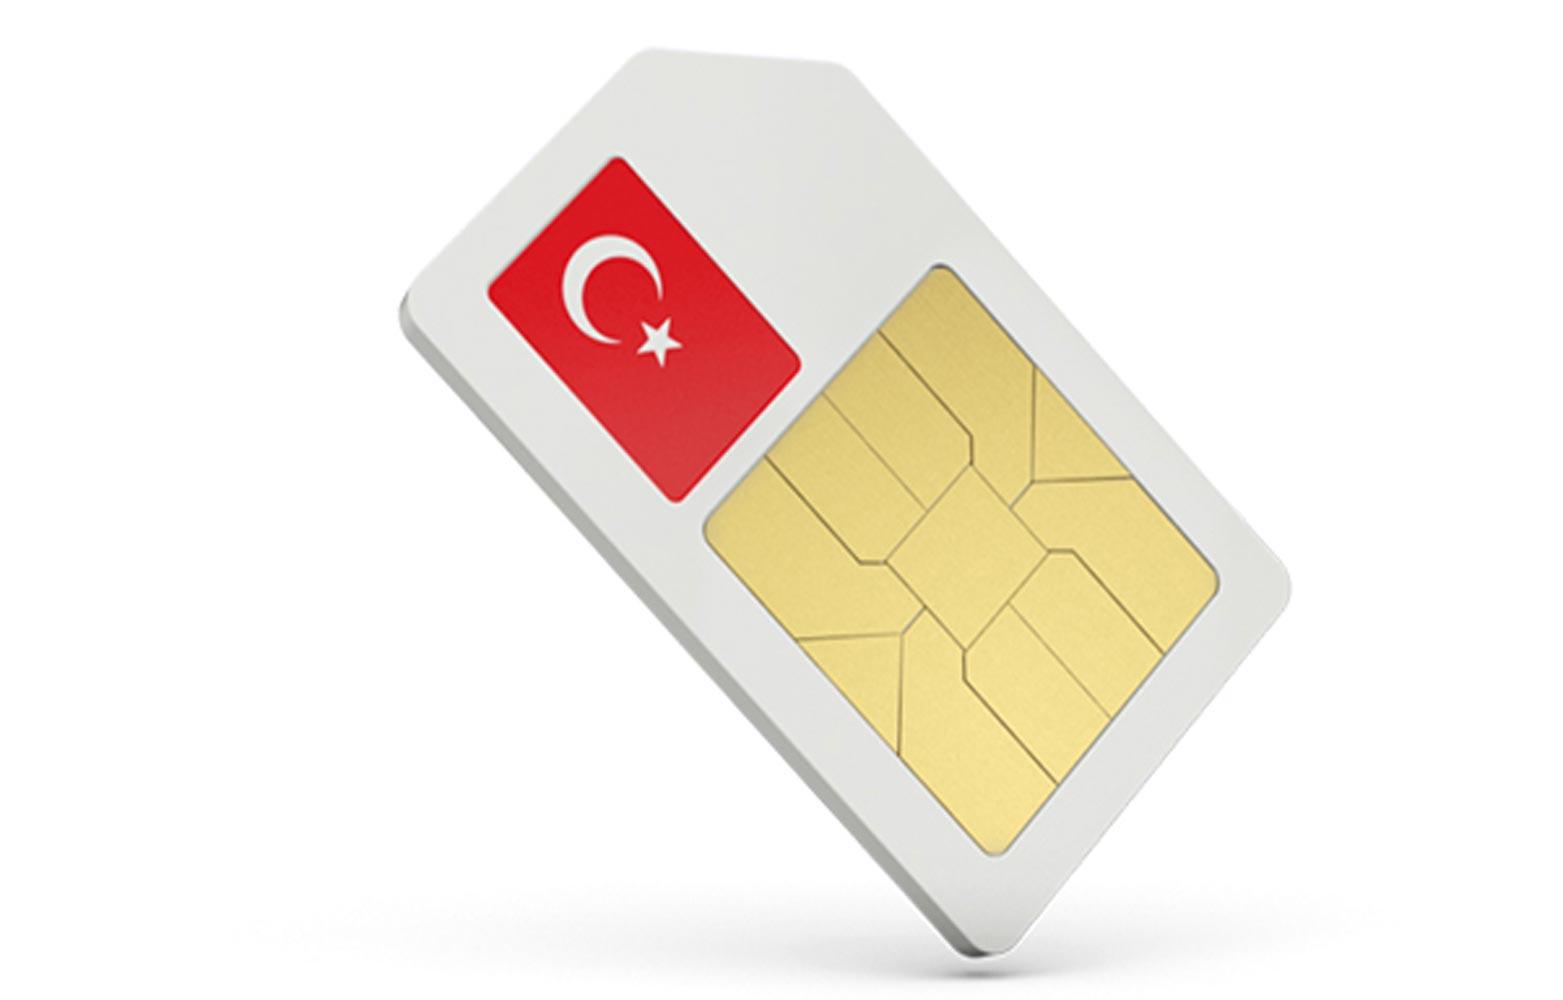 سیم کاتر ترکیه